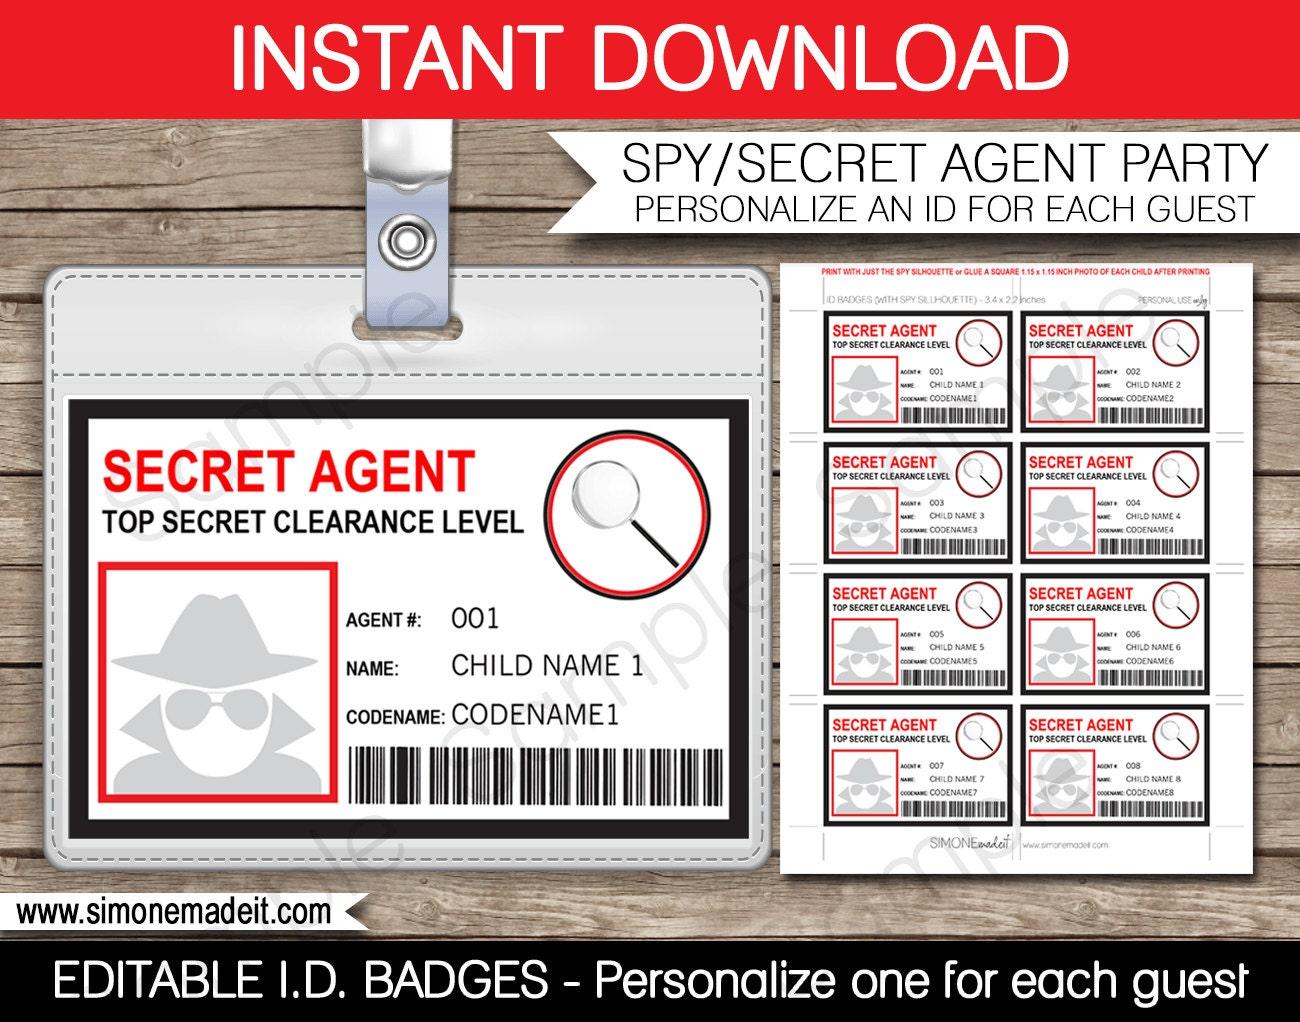 Secret Agent Badge Printable : www.galleryhip.com - The Hippest Pics